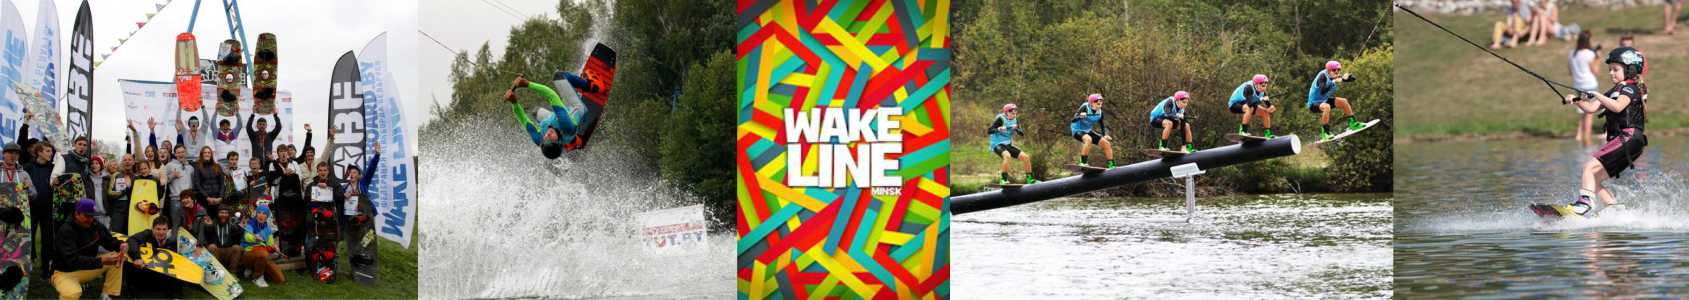 Вейкбордный клуб Wake Line